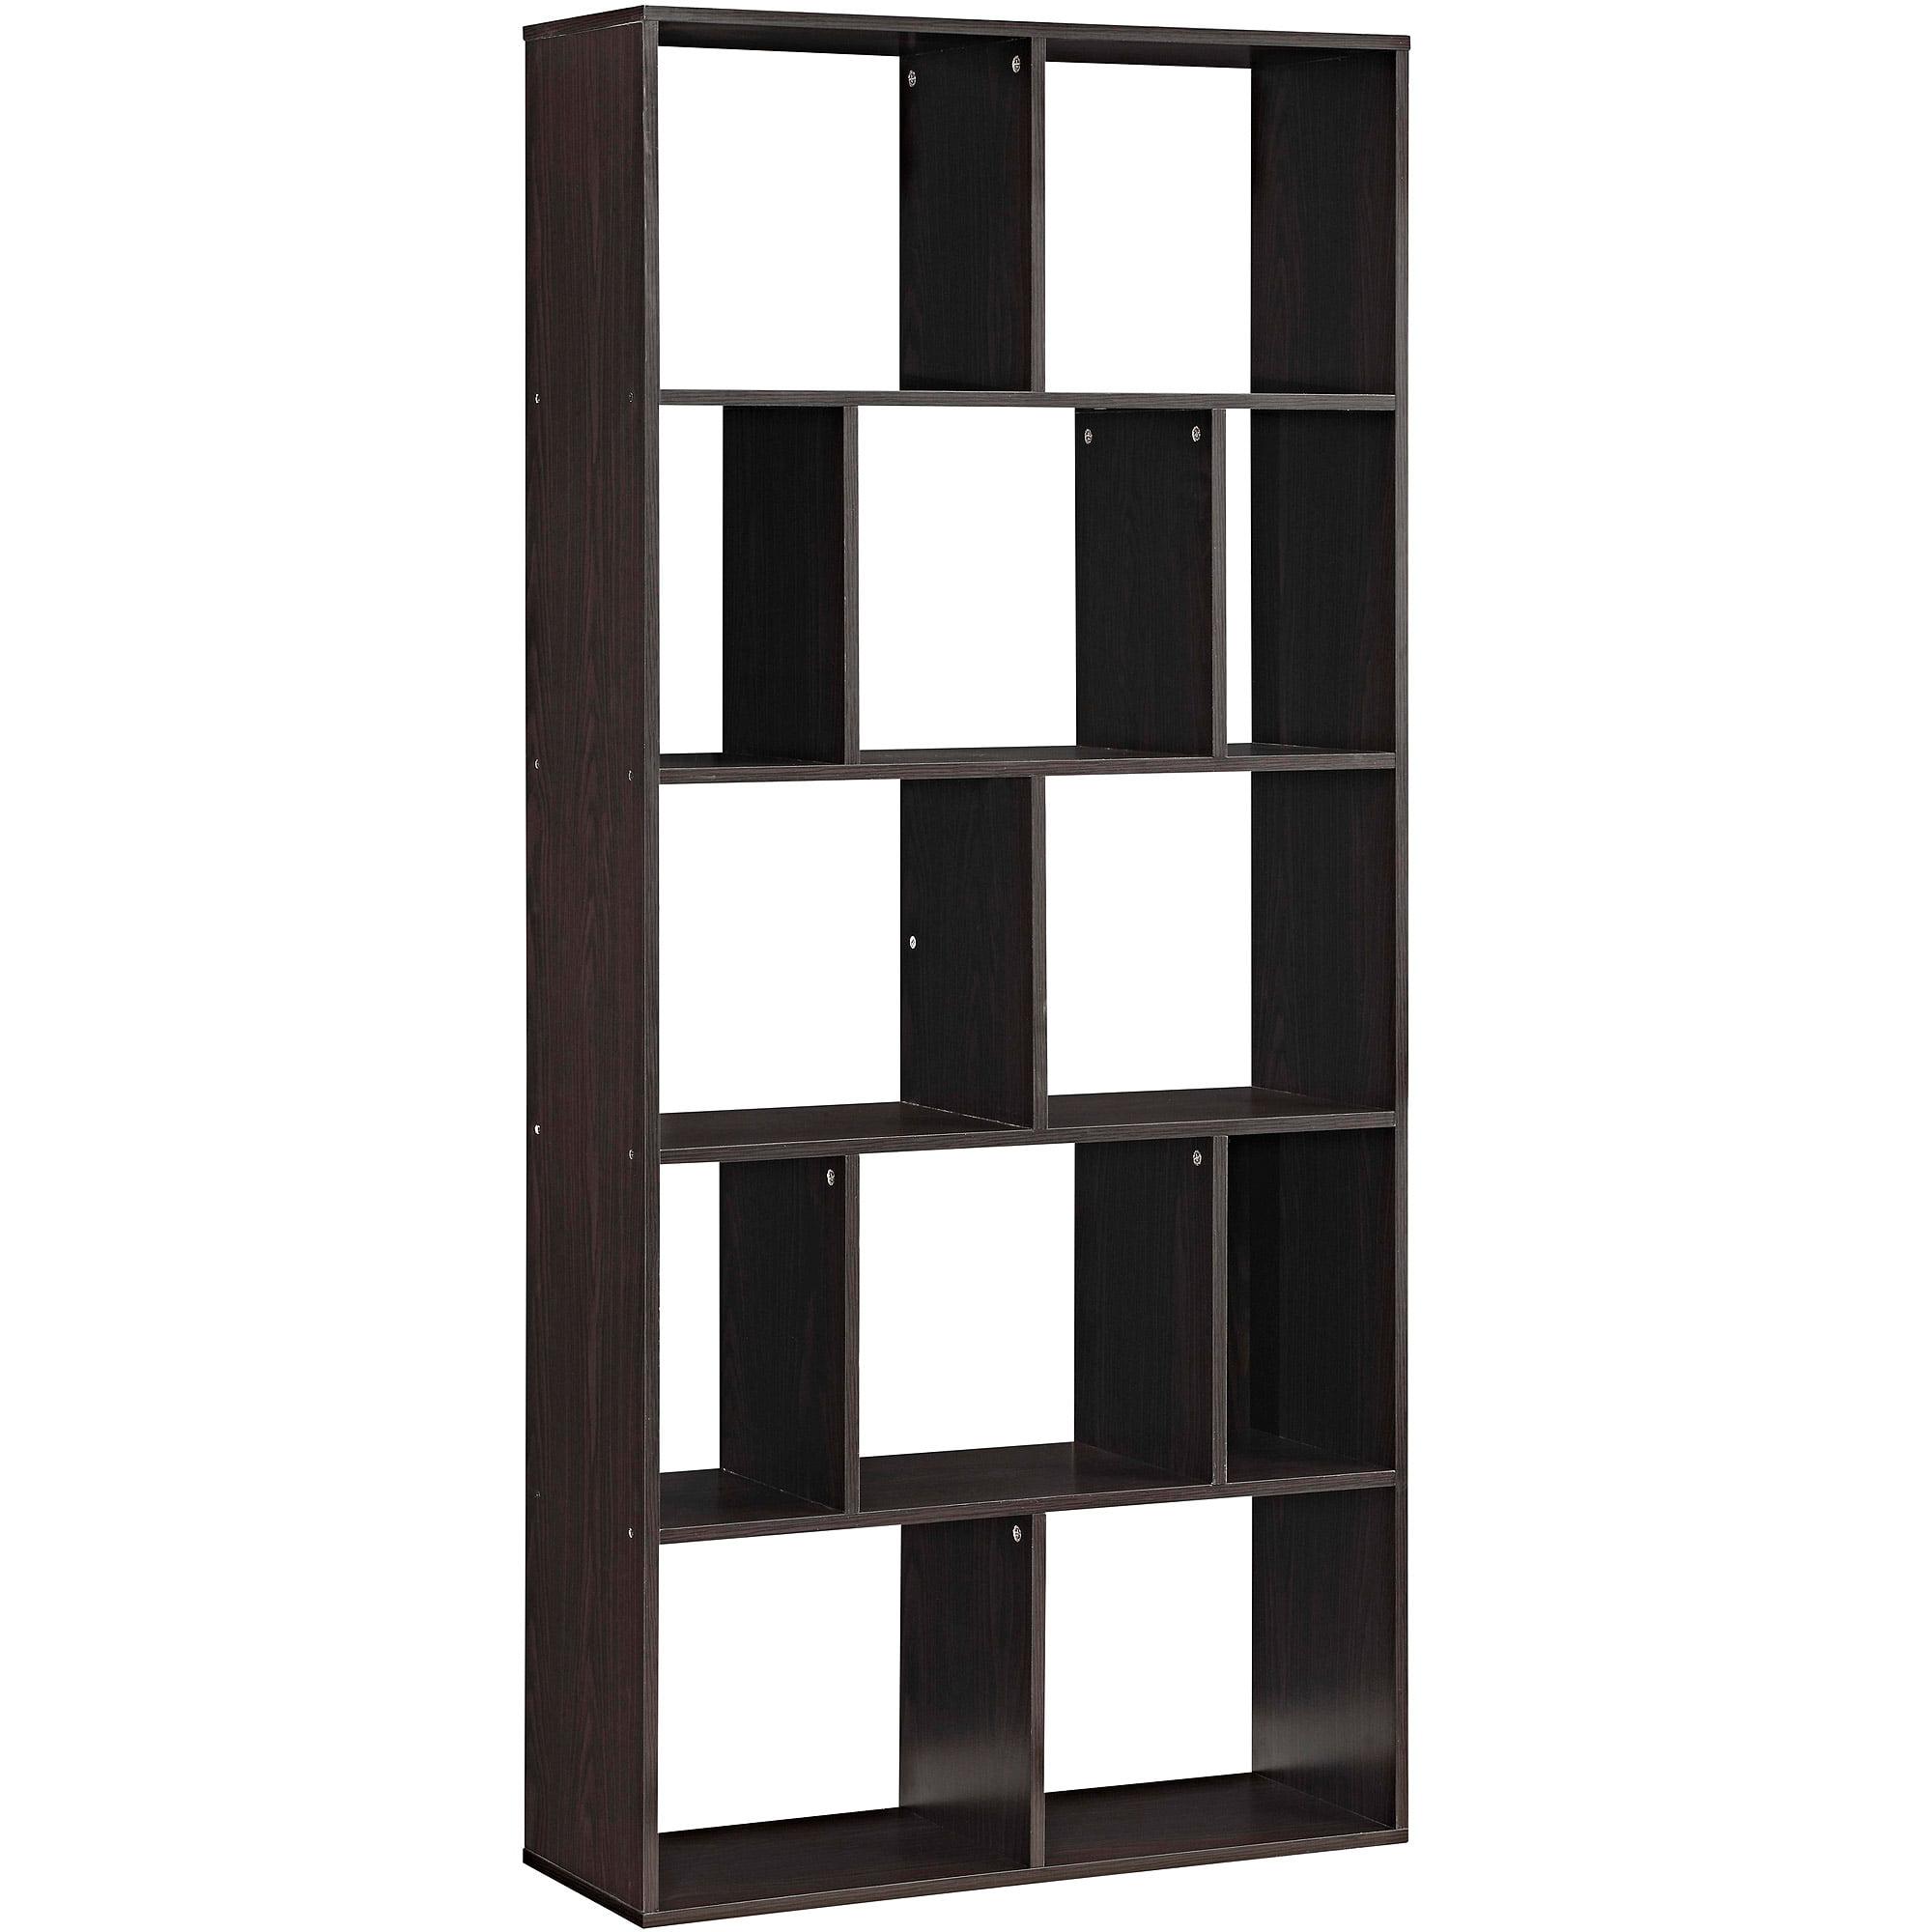 Mainstays Home 12-Shelf Bookcase